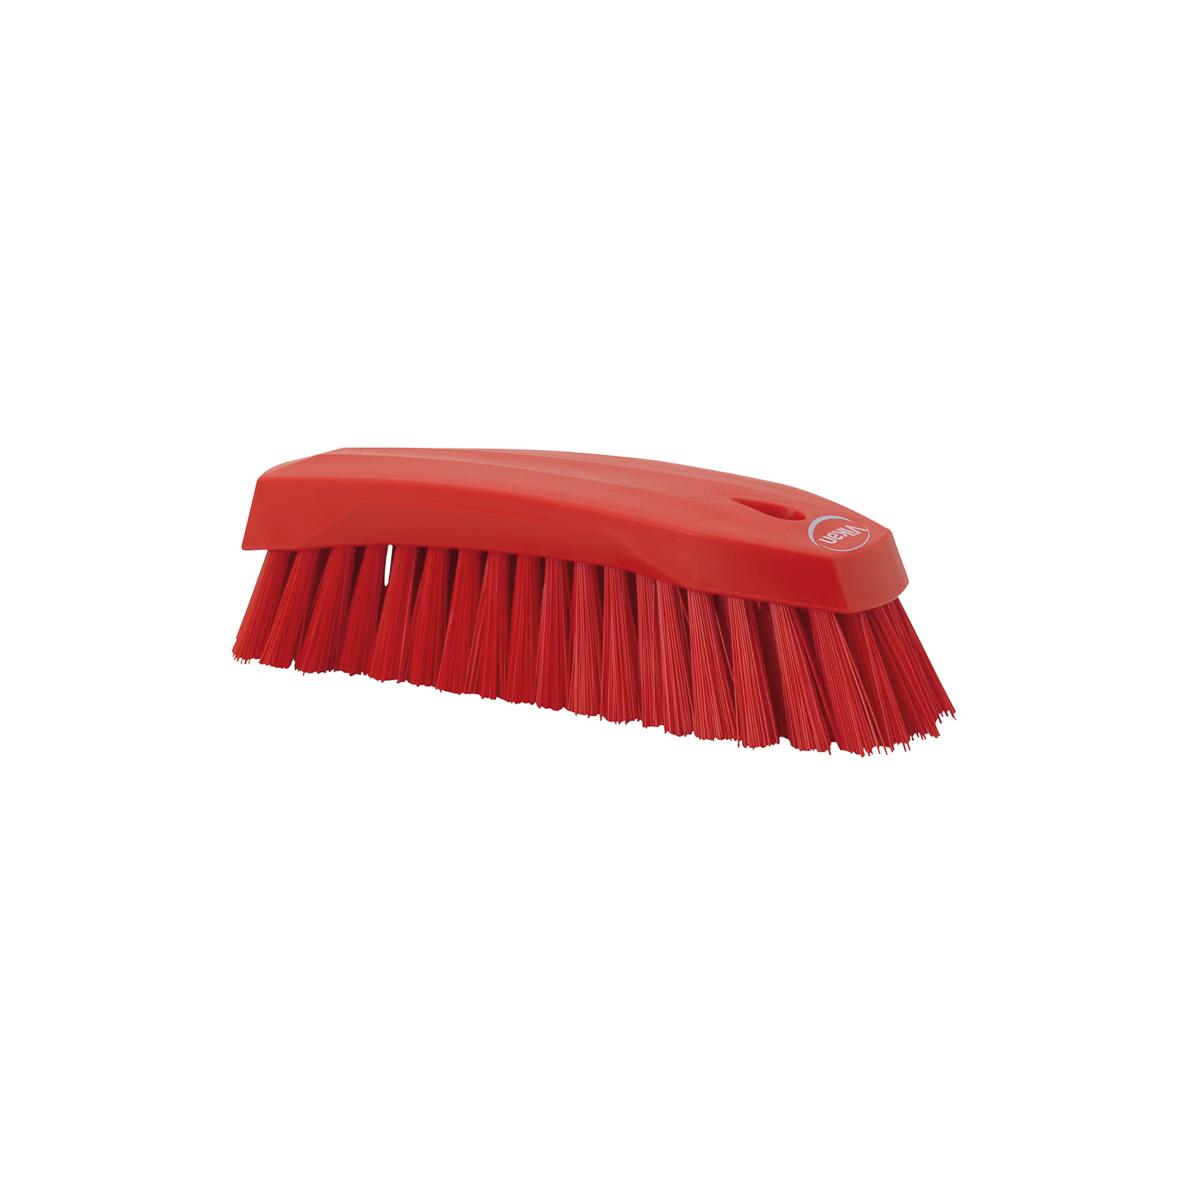 Handschrubbürste Vikan 200mm